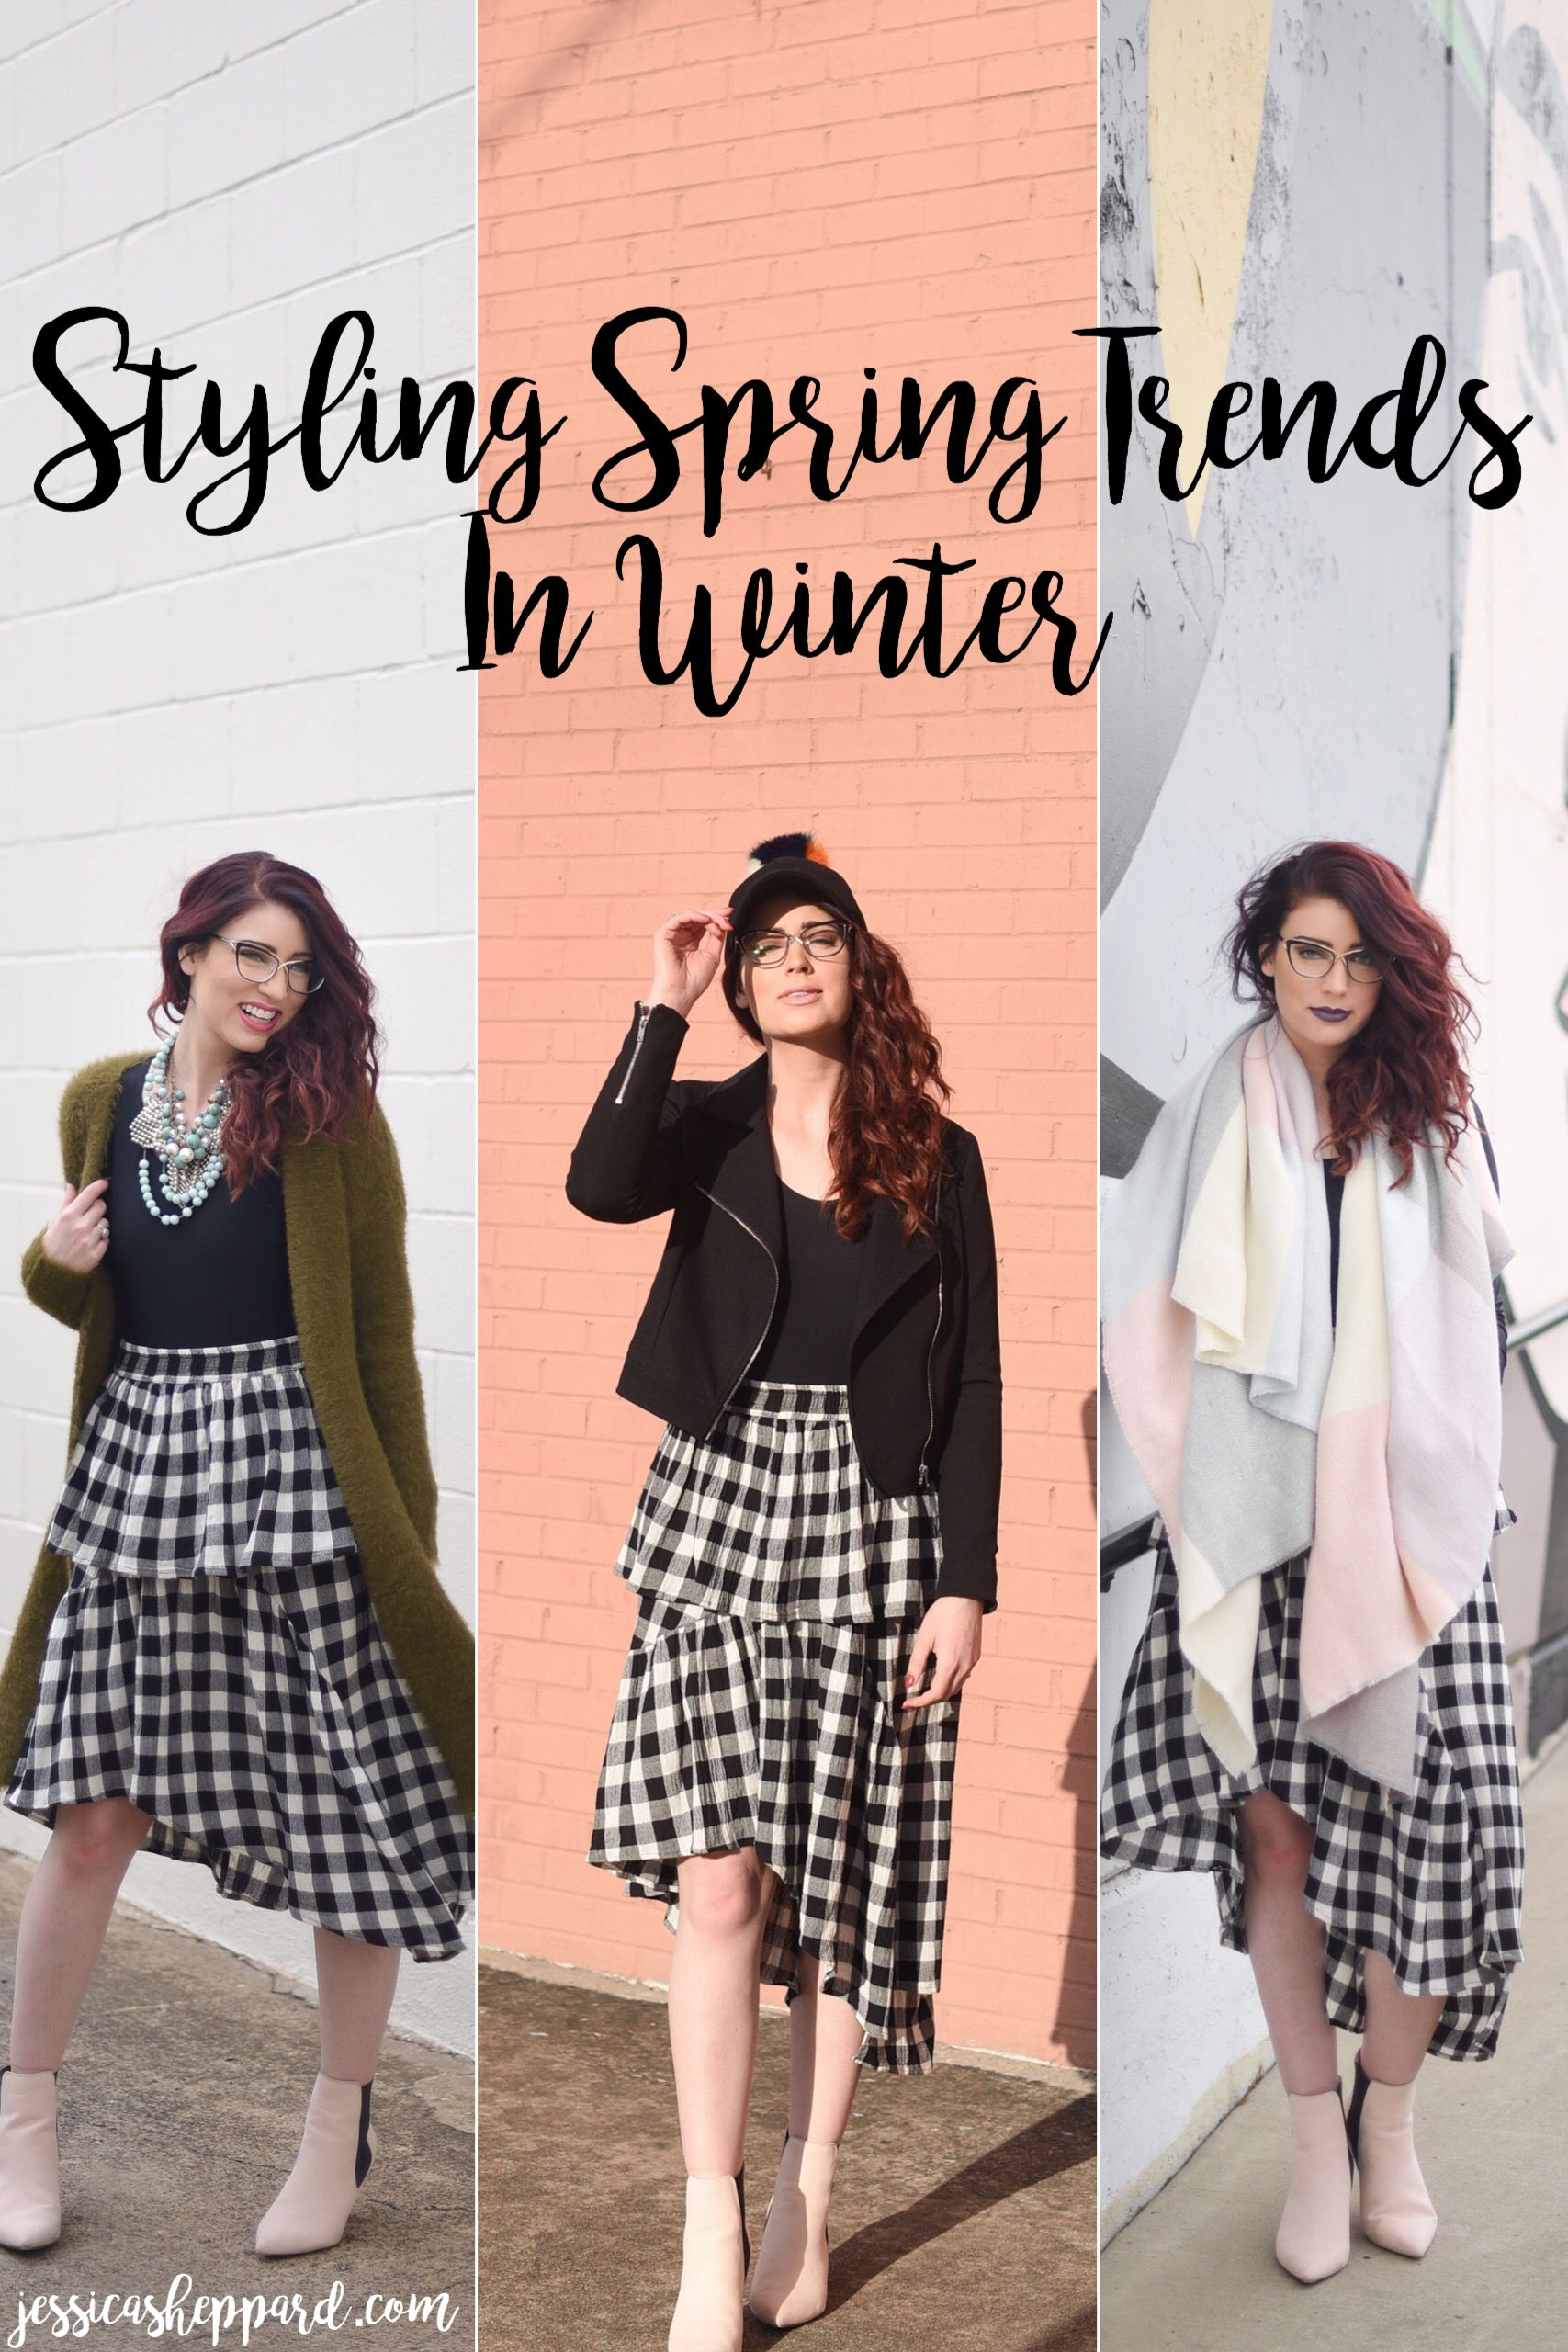 Watch Wearing Your Winter Wardrobe In Spring video